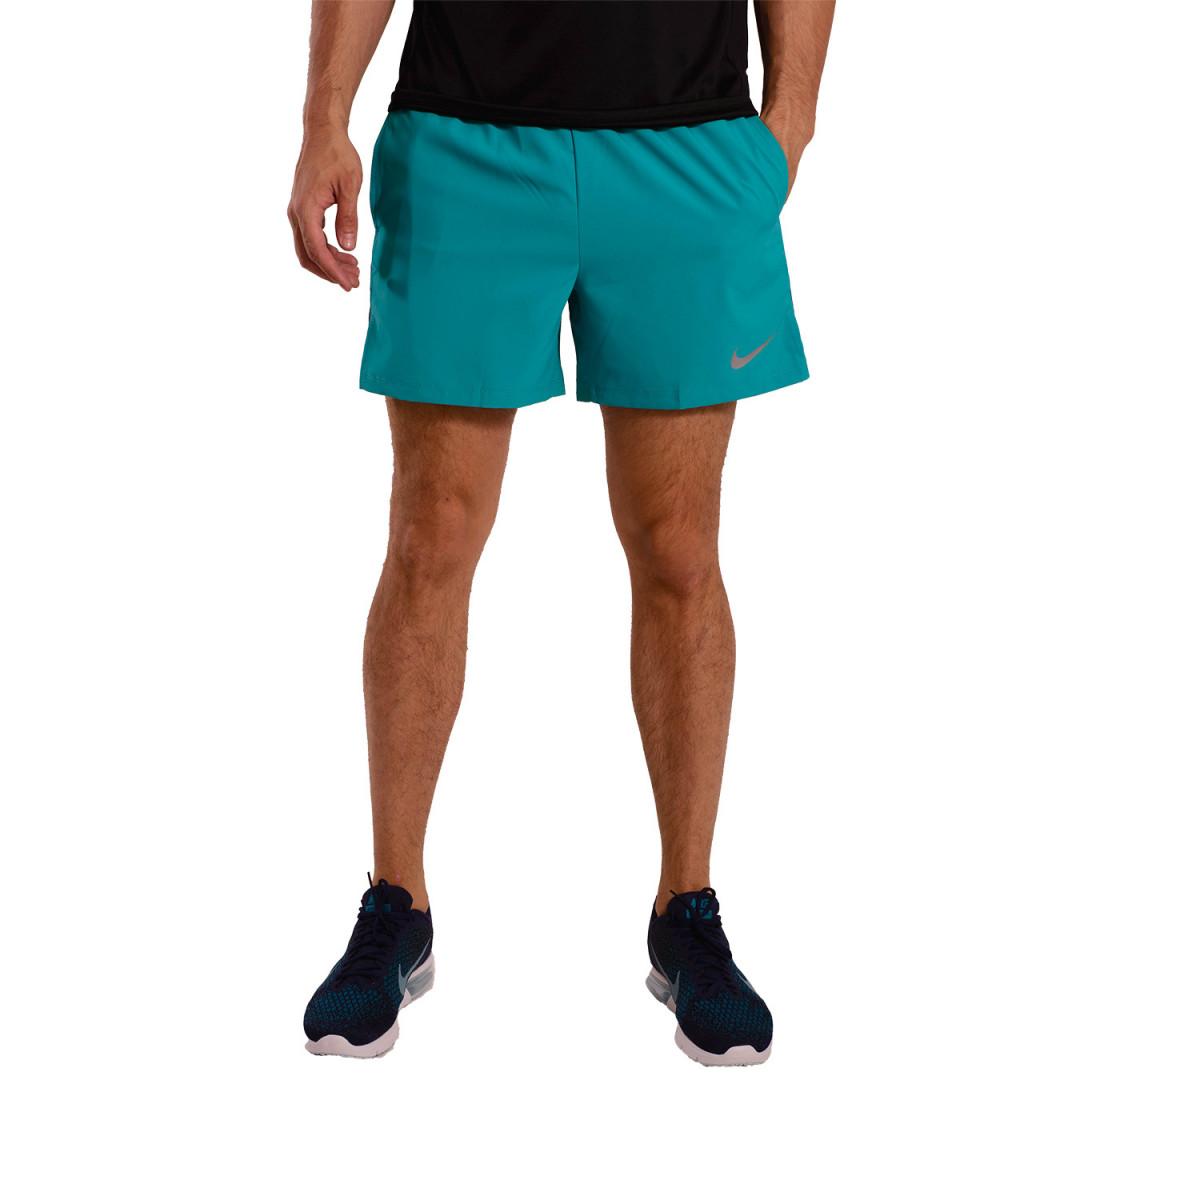 Challenger Short Indumentaria Flex Nike Hombre BZ6BFW7r